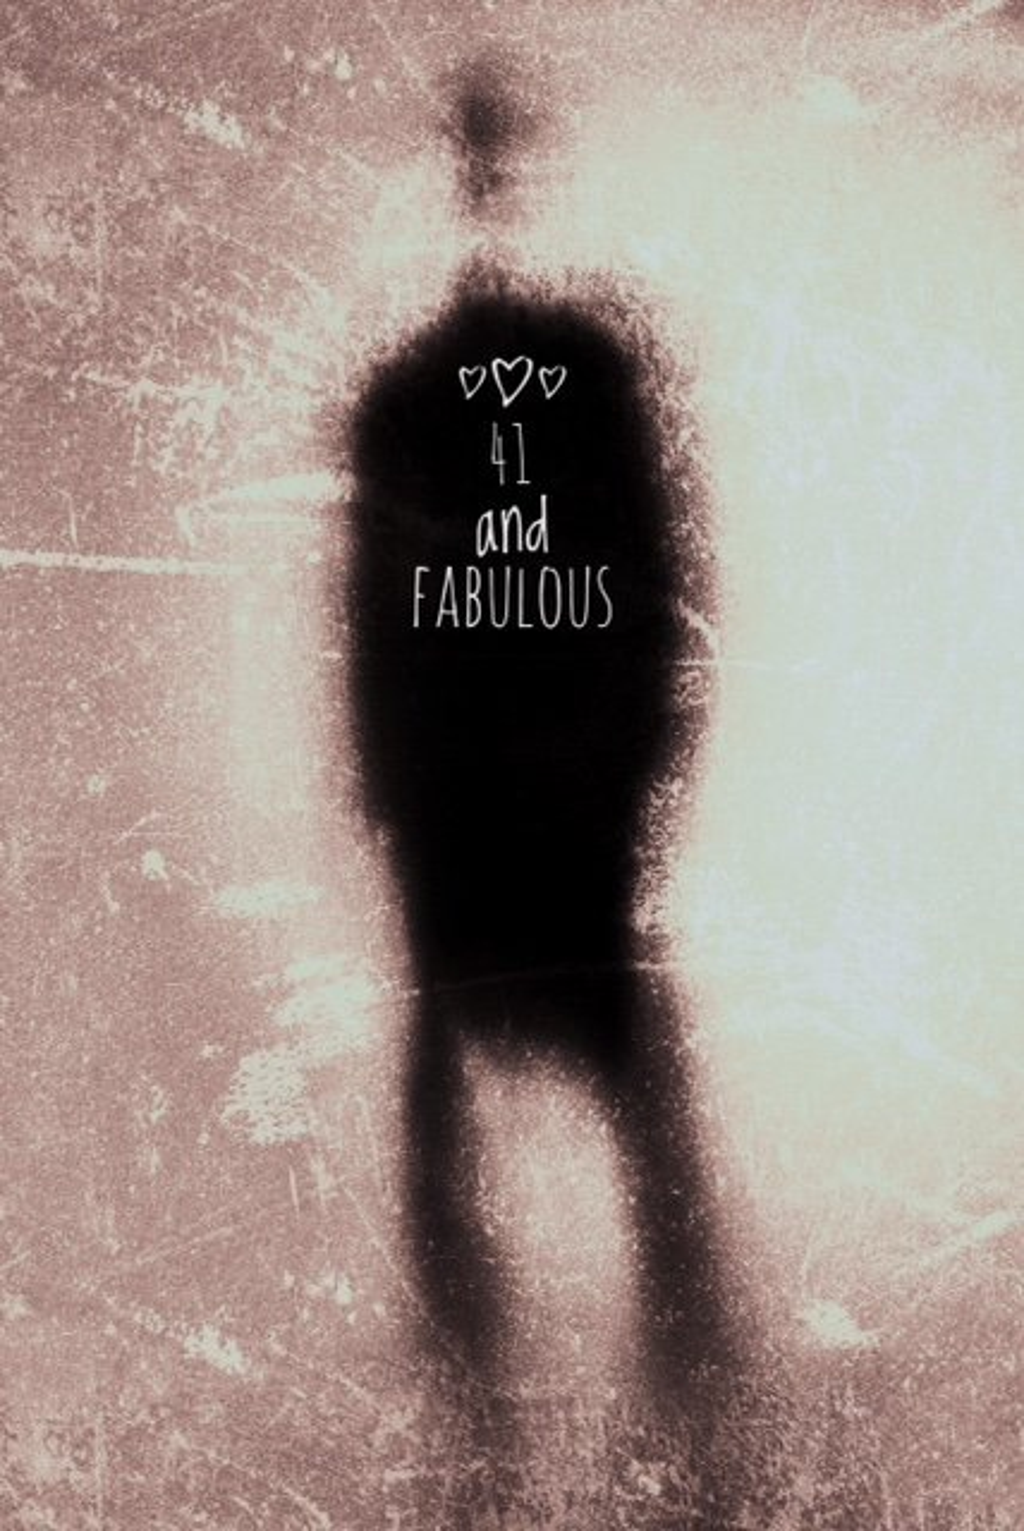 Fabulous:) by joemuli